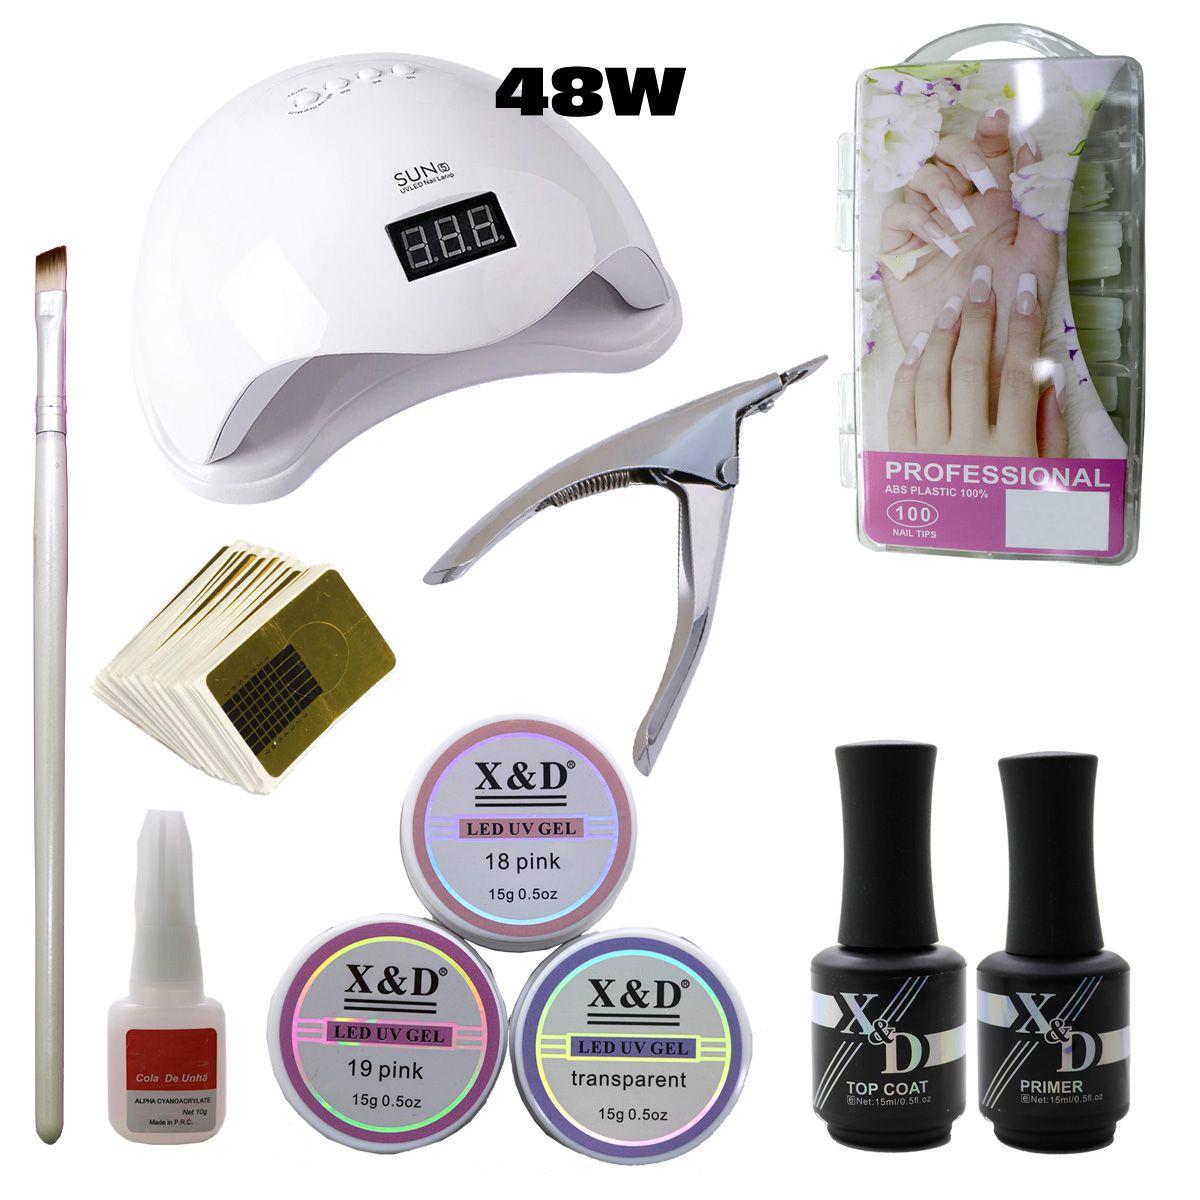 Kit Unha Gel Acrigel Led UV Sun 5 48W Top Coat Primer 583XD